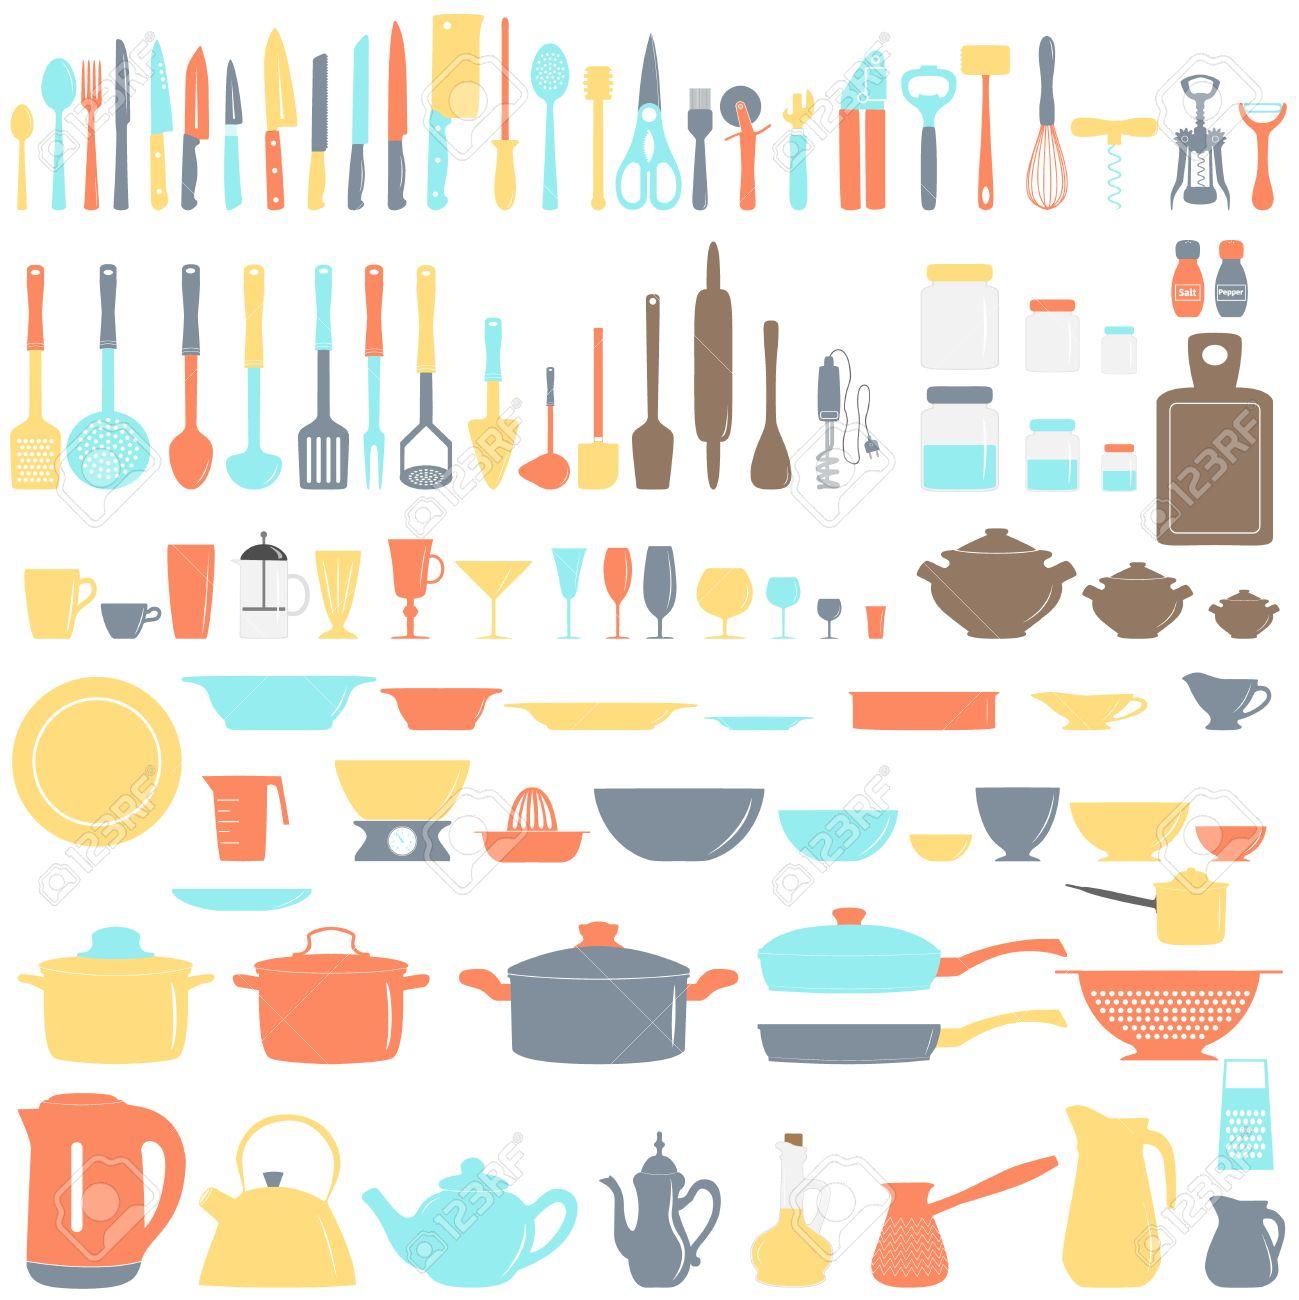 Set of kitchen utensils, vector illustration - 49425295